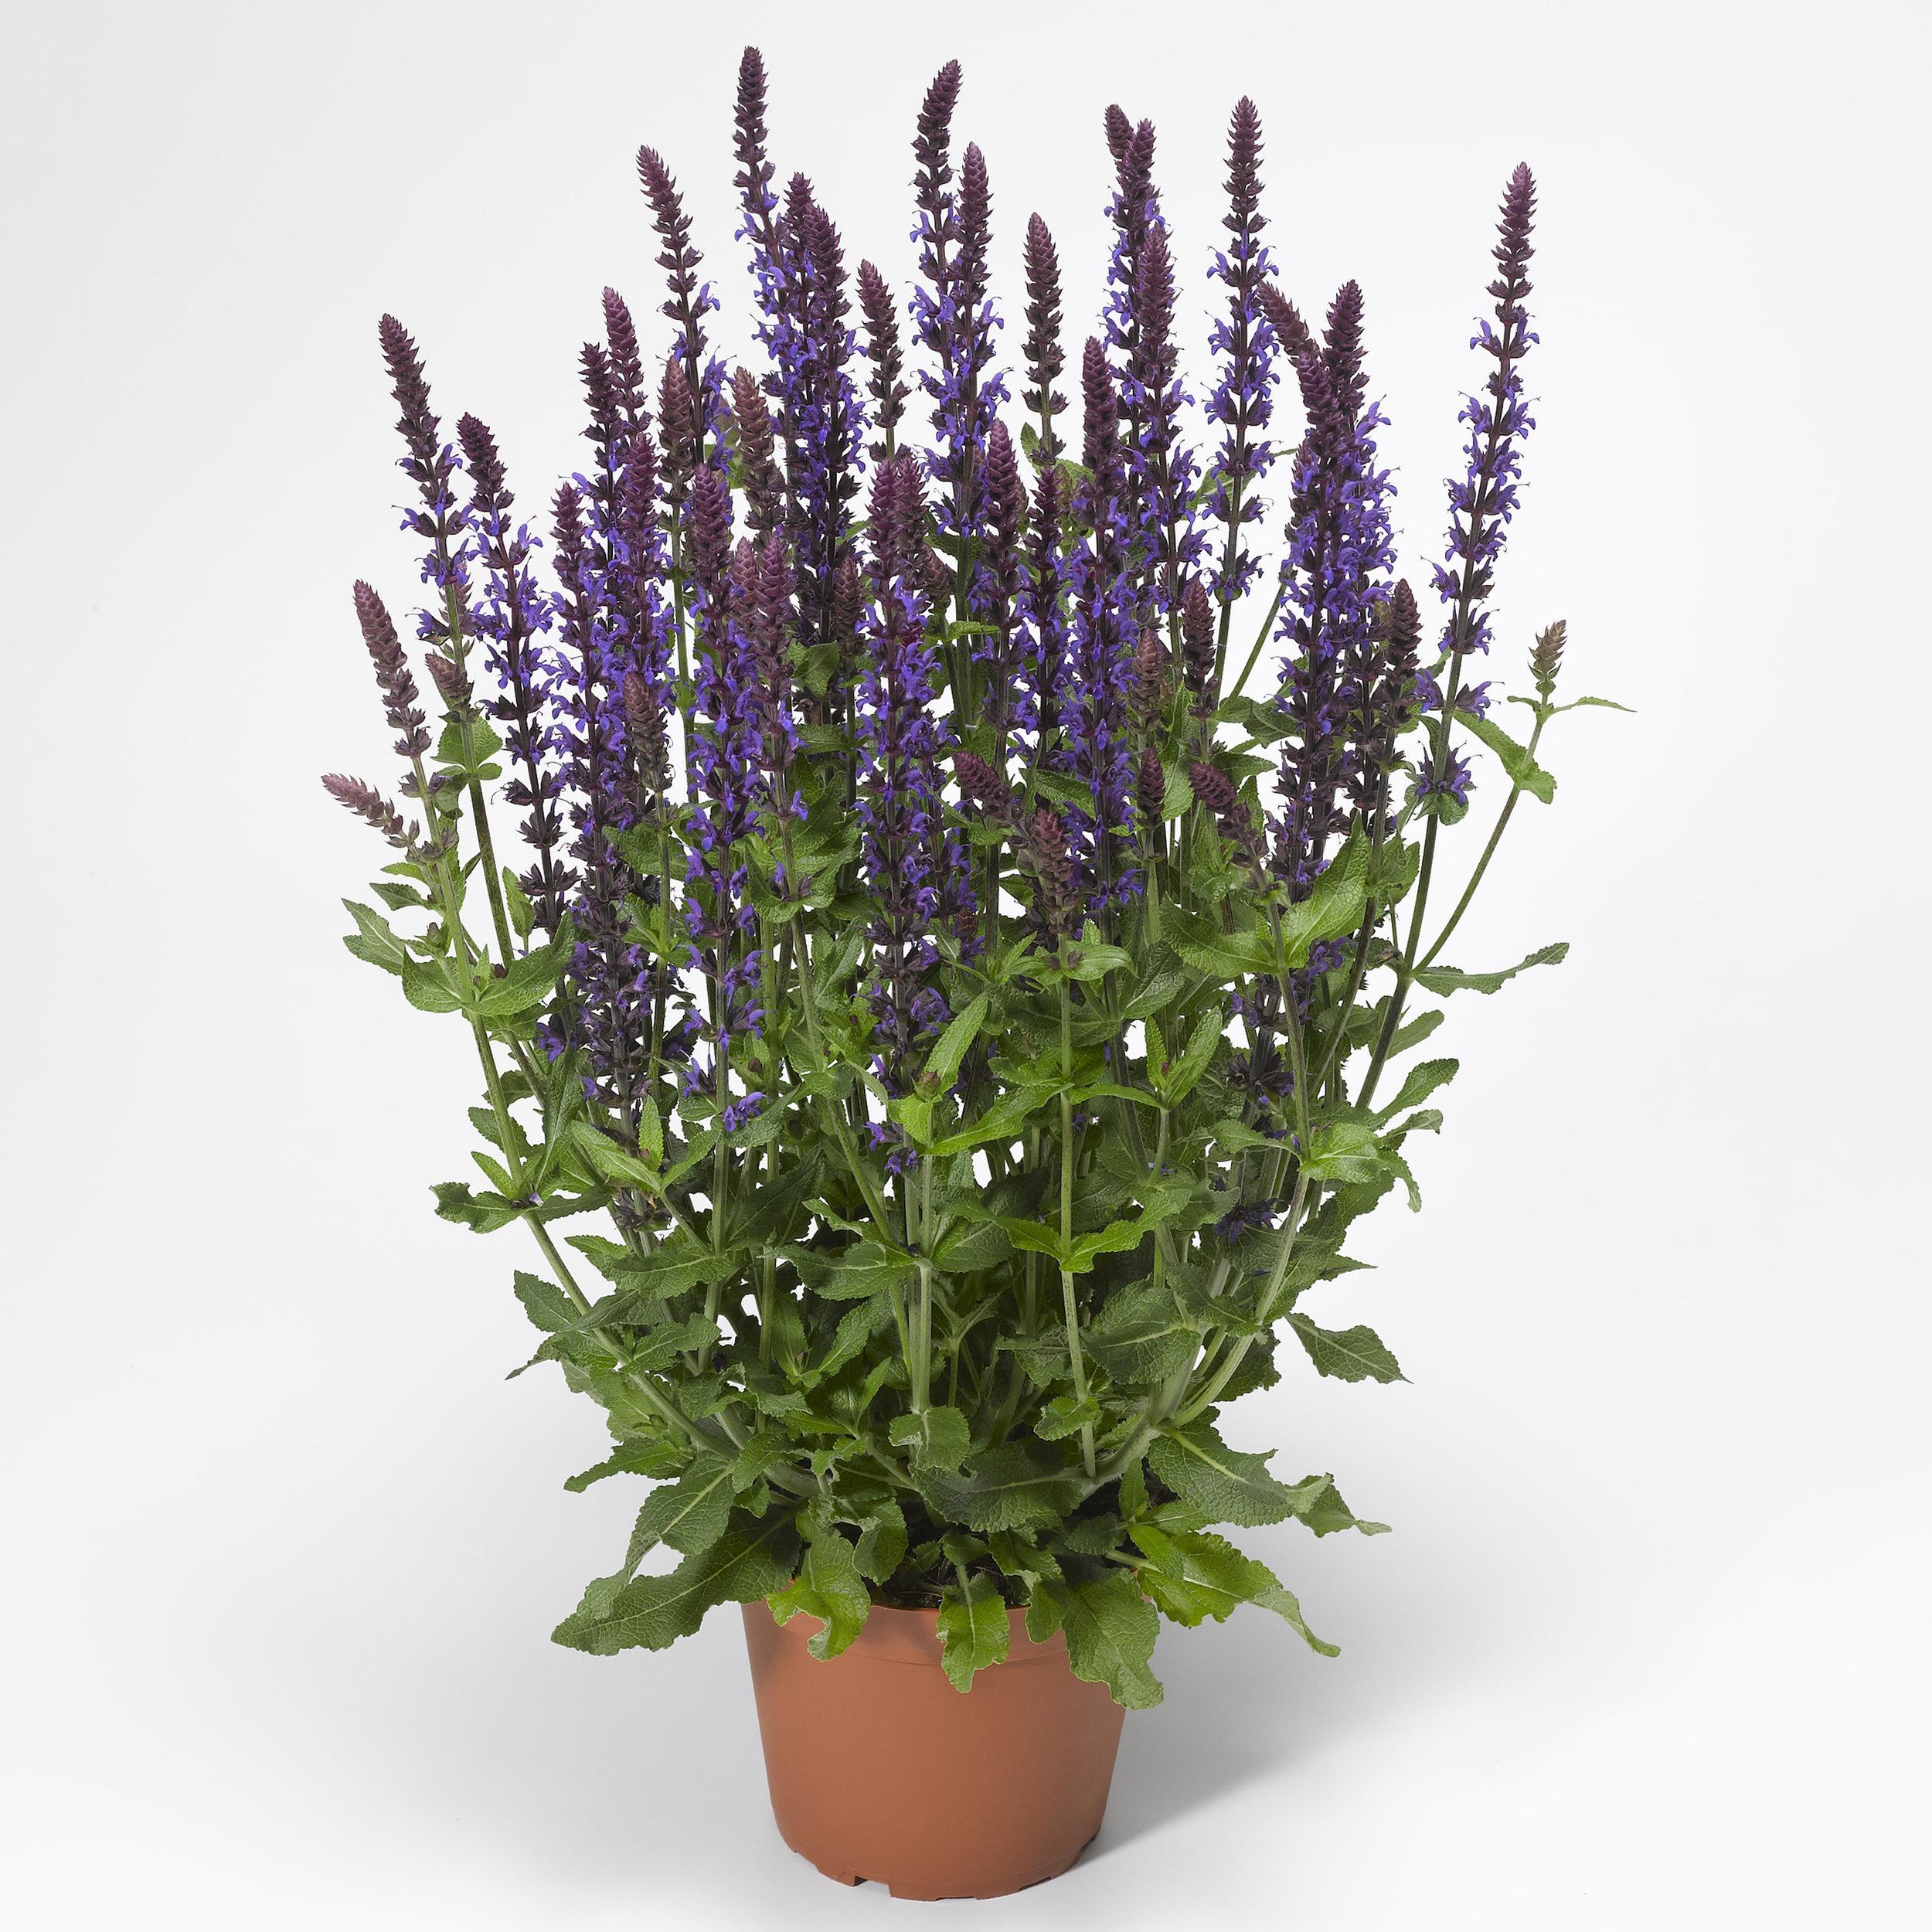 HR_Vegetative_Salvia_Bordeau™_Bordeau™_Deep_Blue_70020739_1.jpg